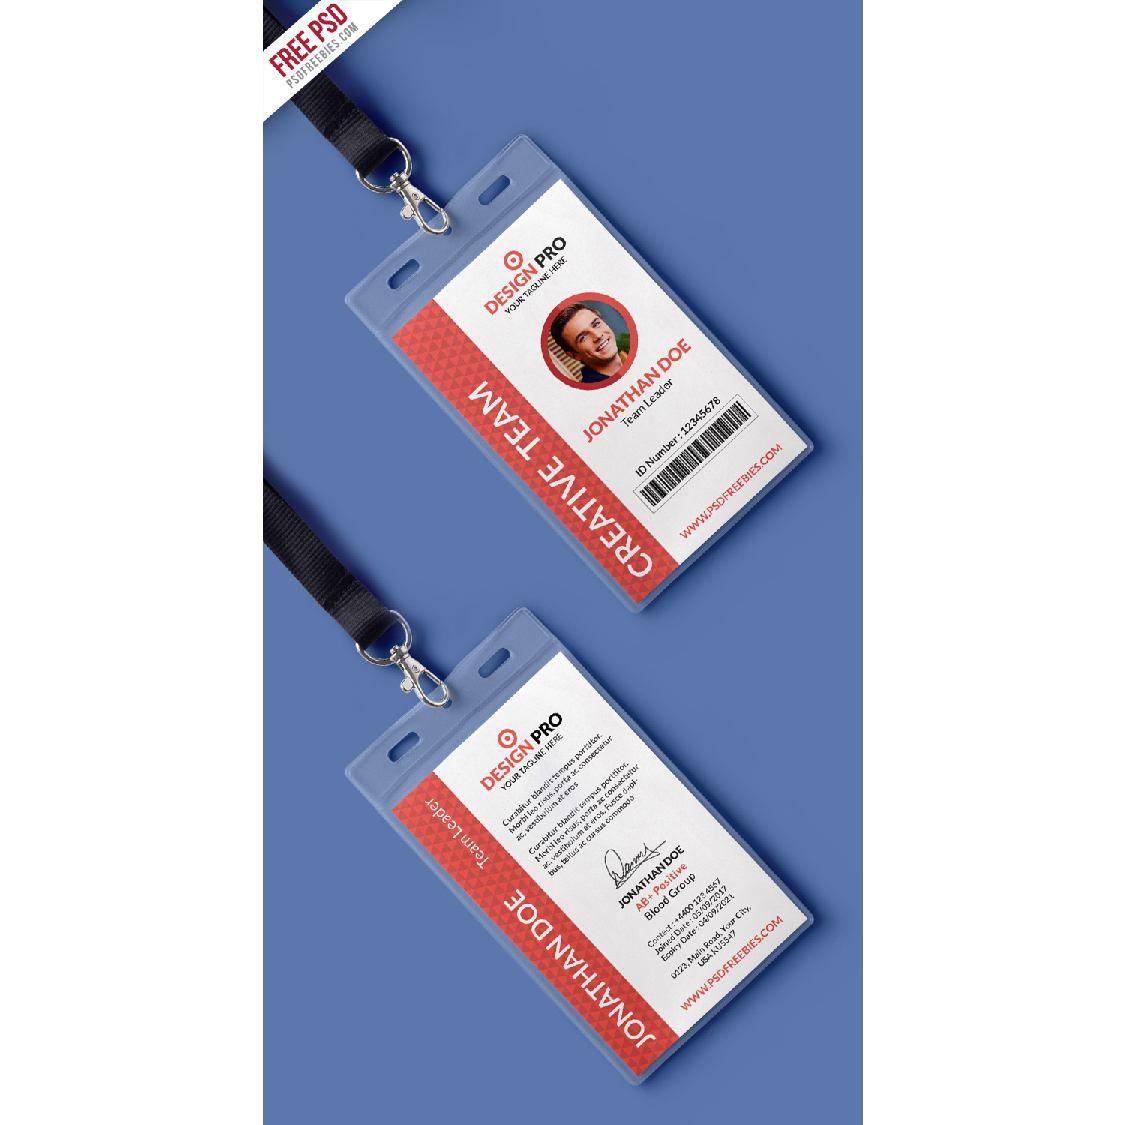 Office Identity Card - Original: goo gl/1X4dzU ↓DOWNLOAD